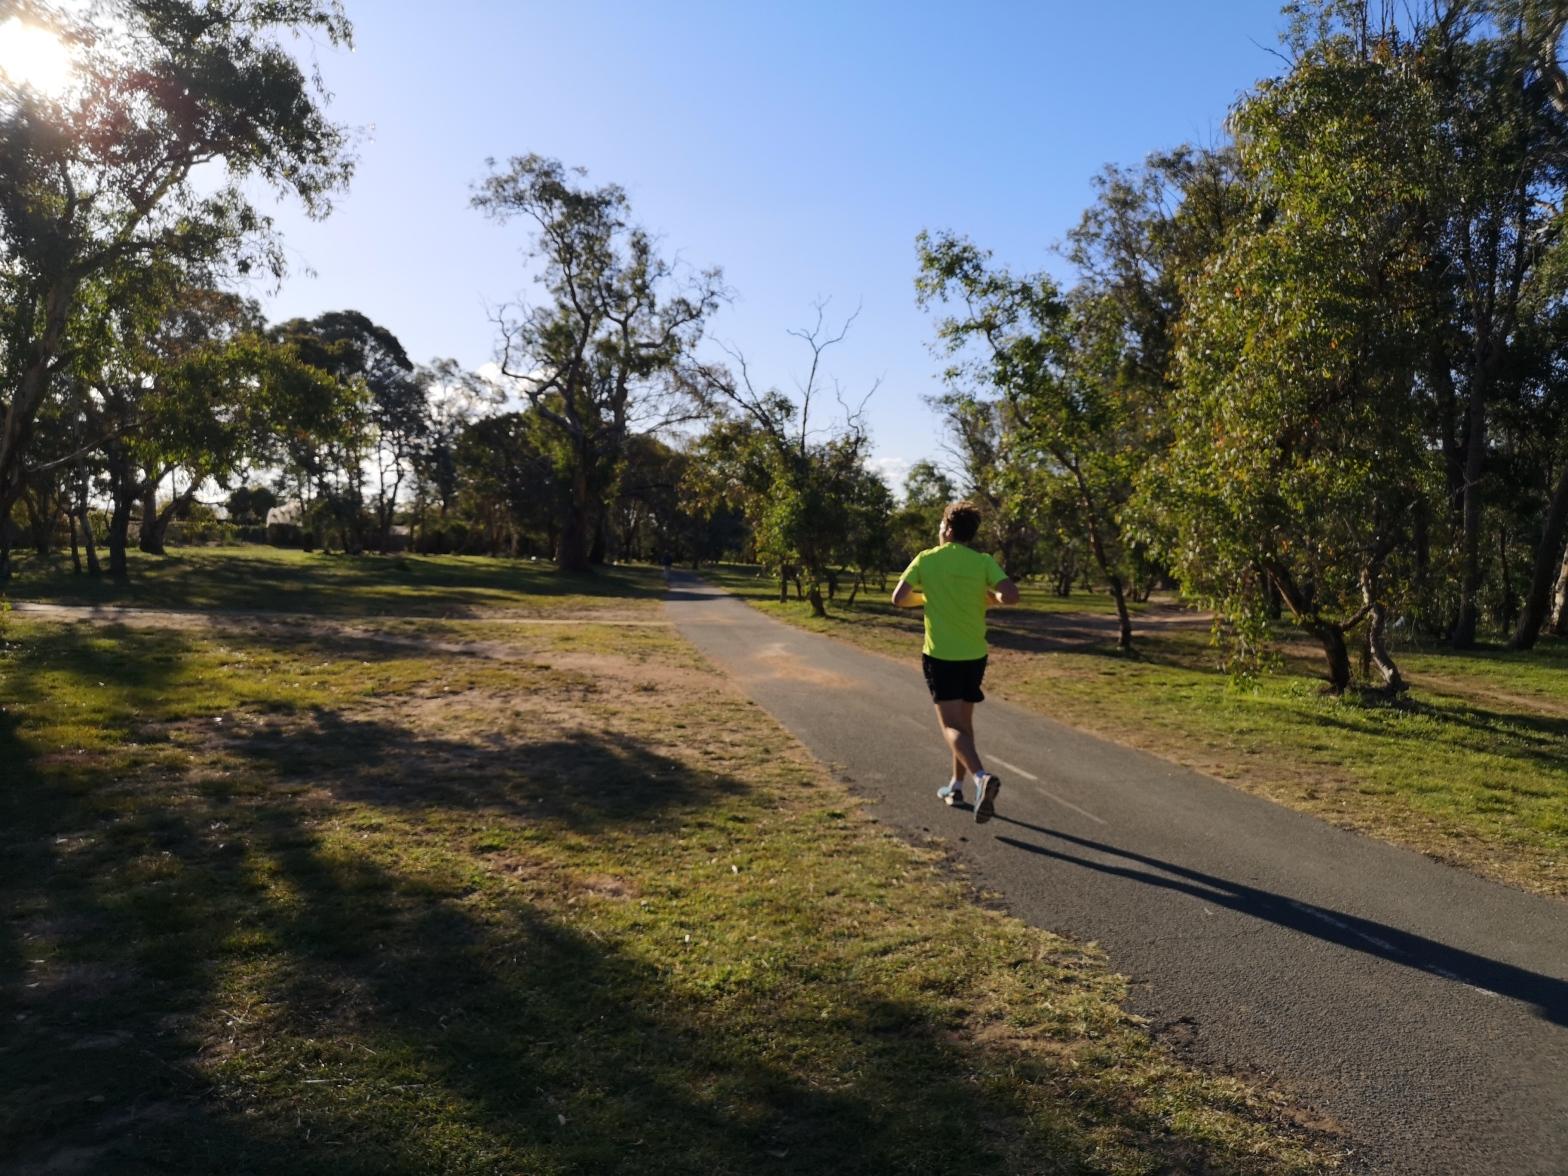 Aranda hill and bike path, Belconnen, ACT, Australia